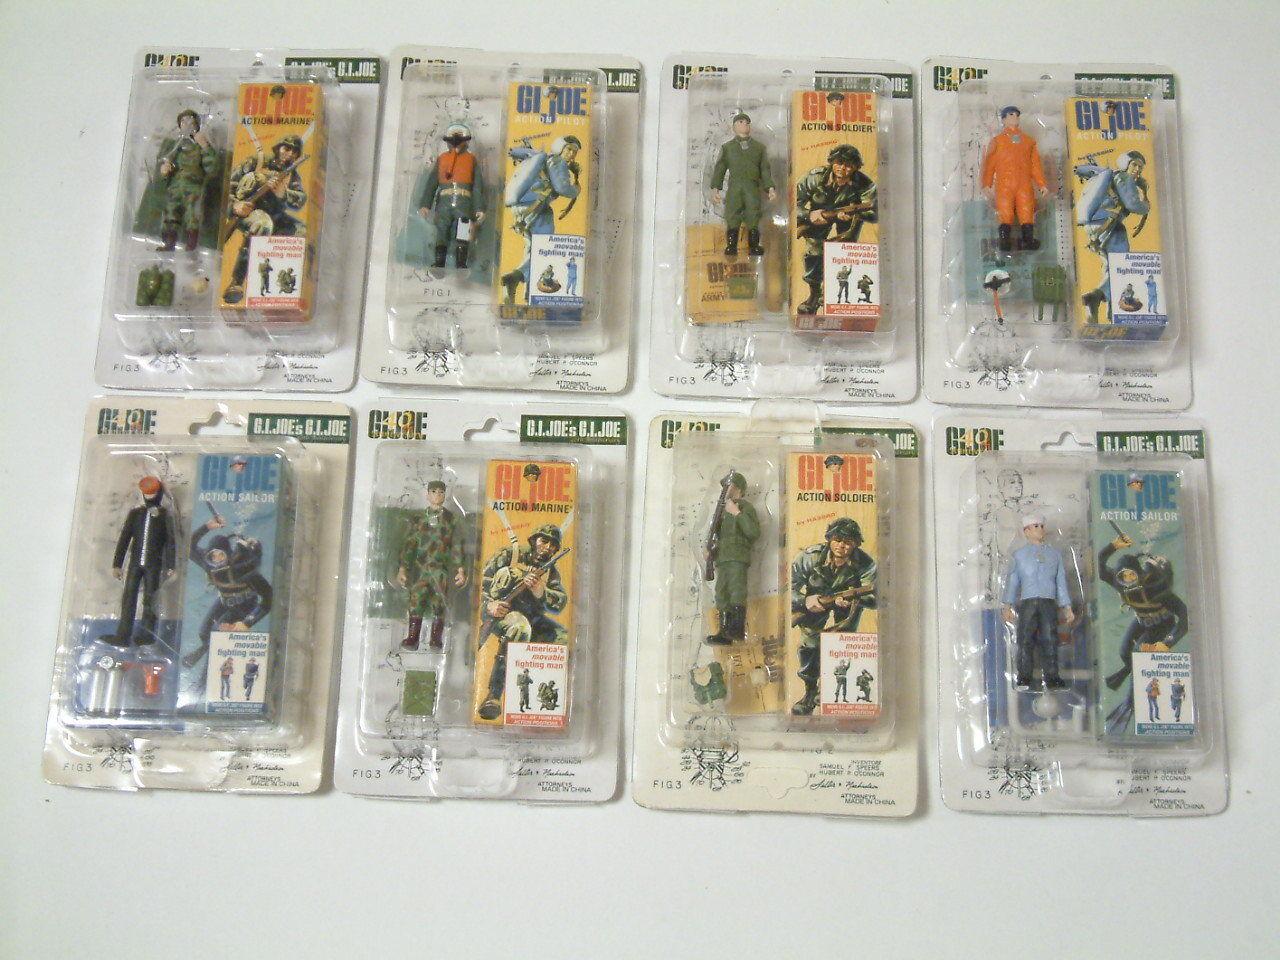 G.I. Joe 40th aniversario TAKARA LTD 2004 1 35 todas las ocho variedades CO completado